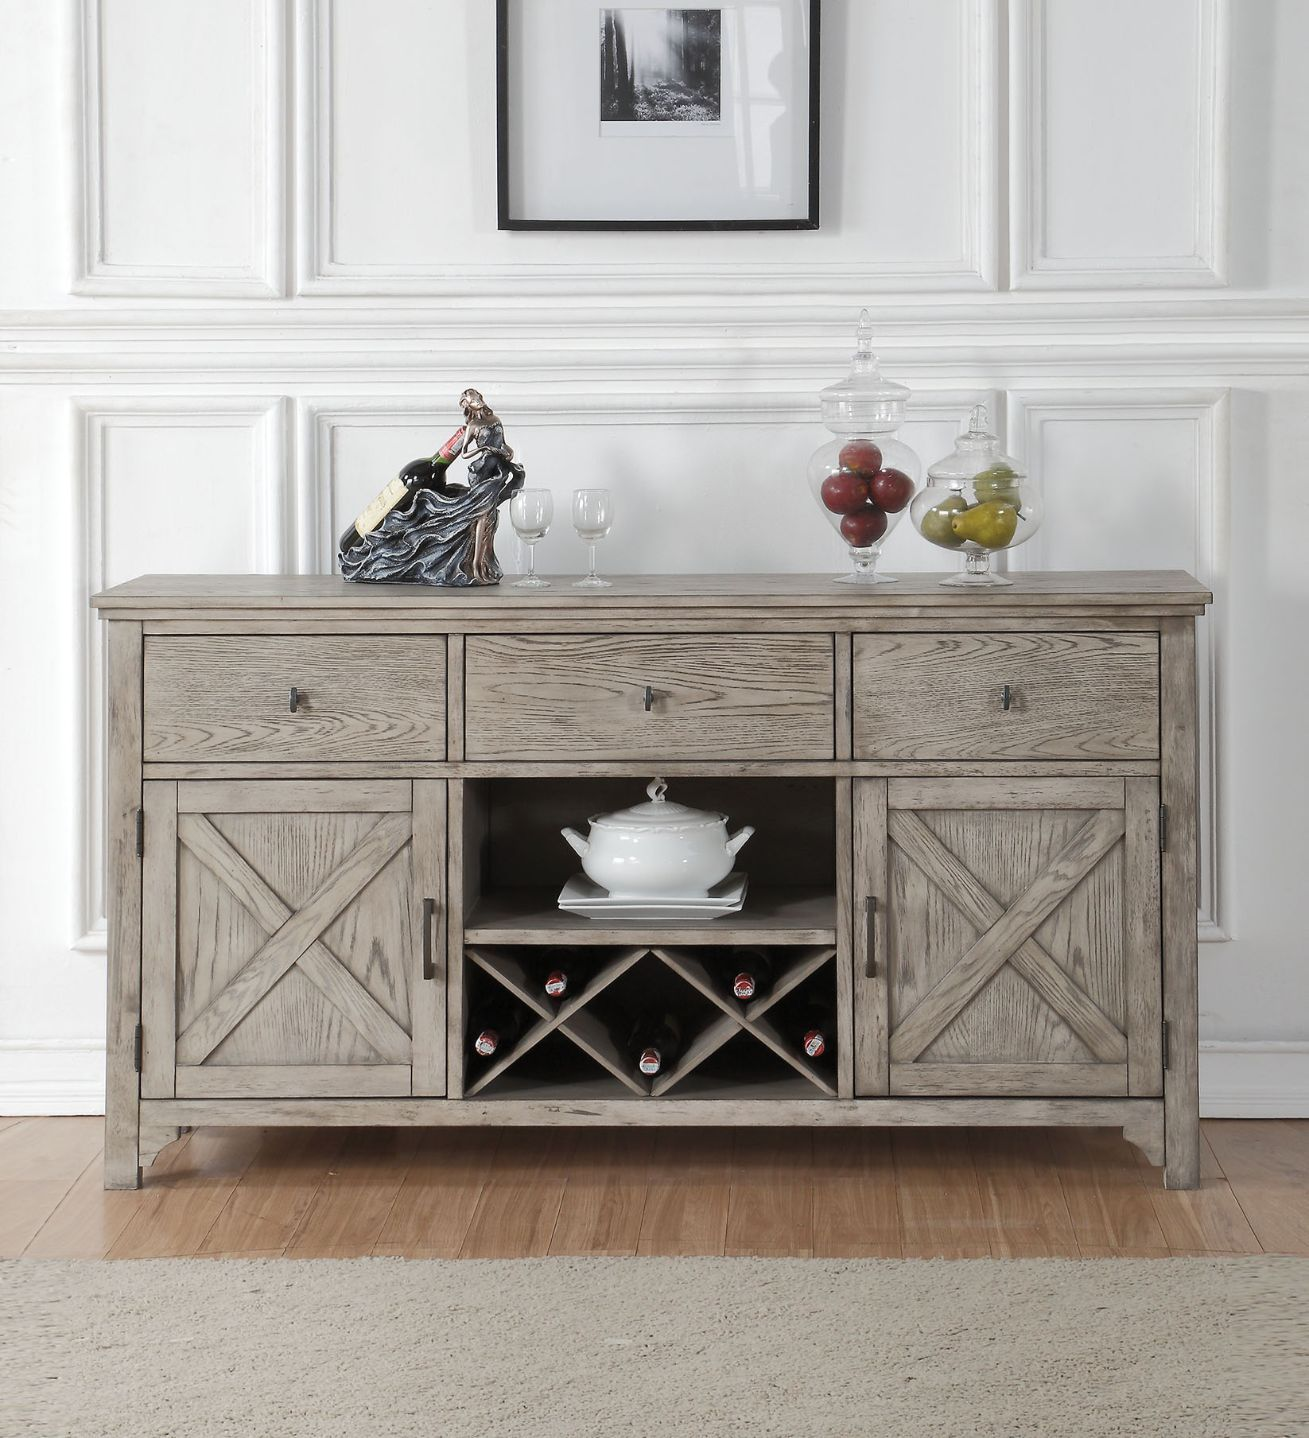 Acme 72864 Gracie oaks denham rocky gray oak finish wood sever sideboard cabinet